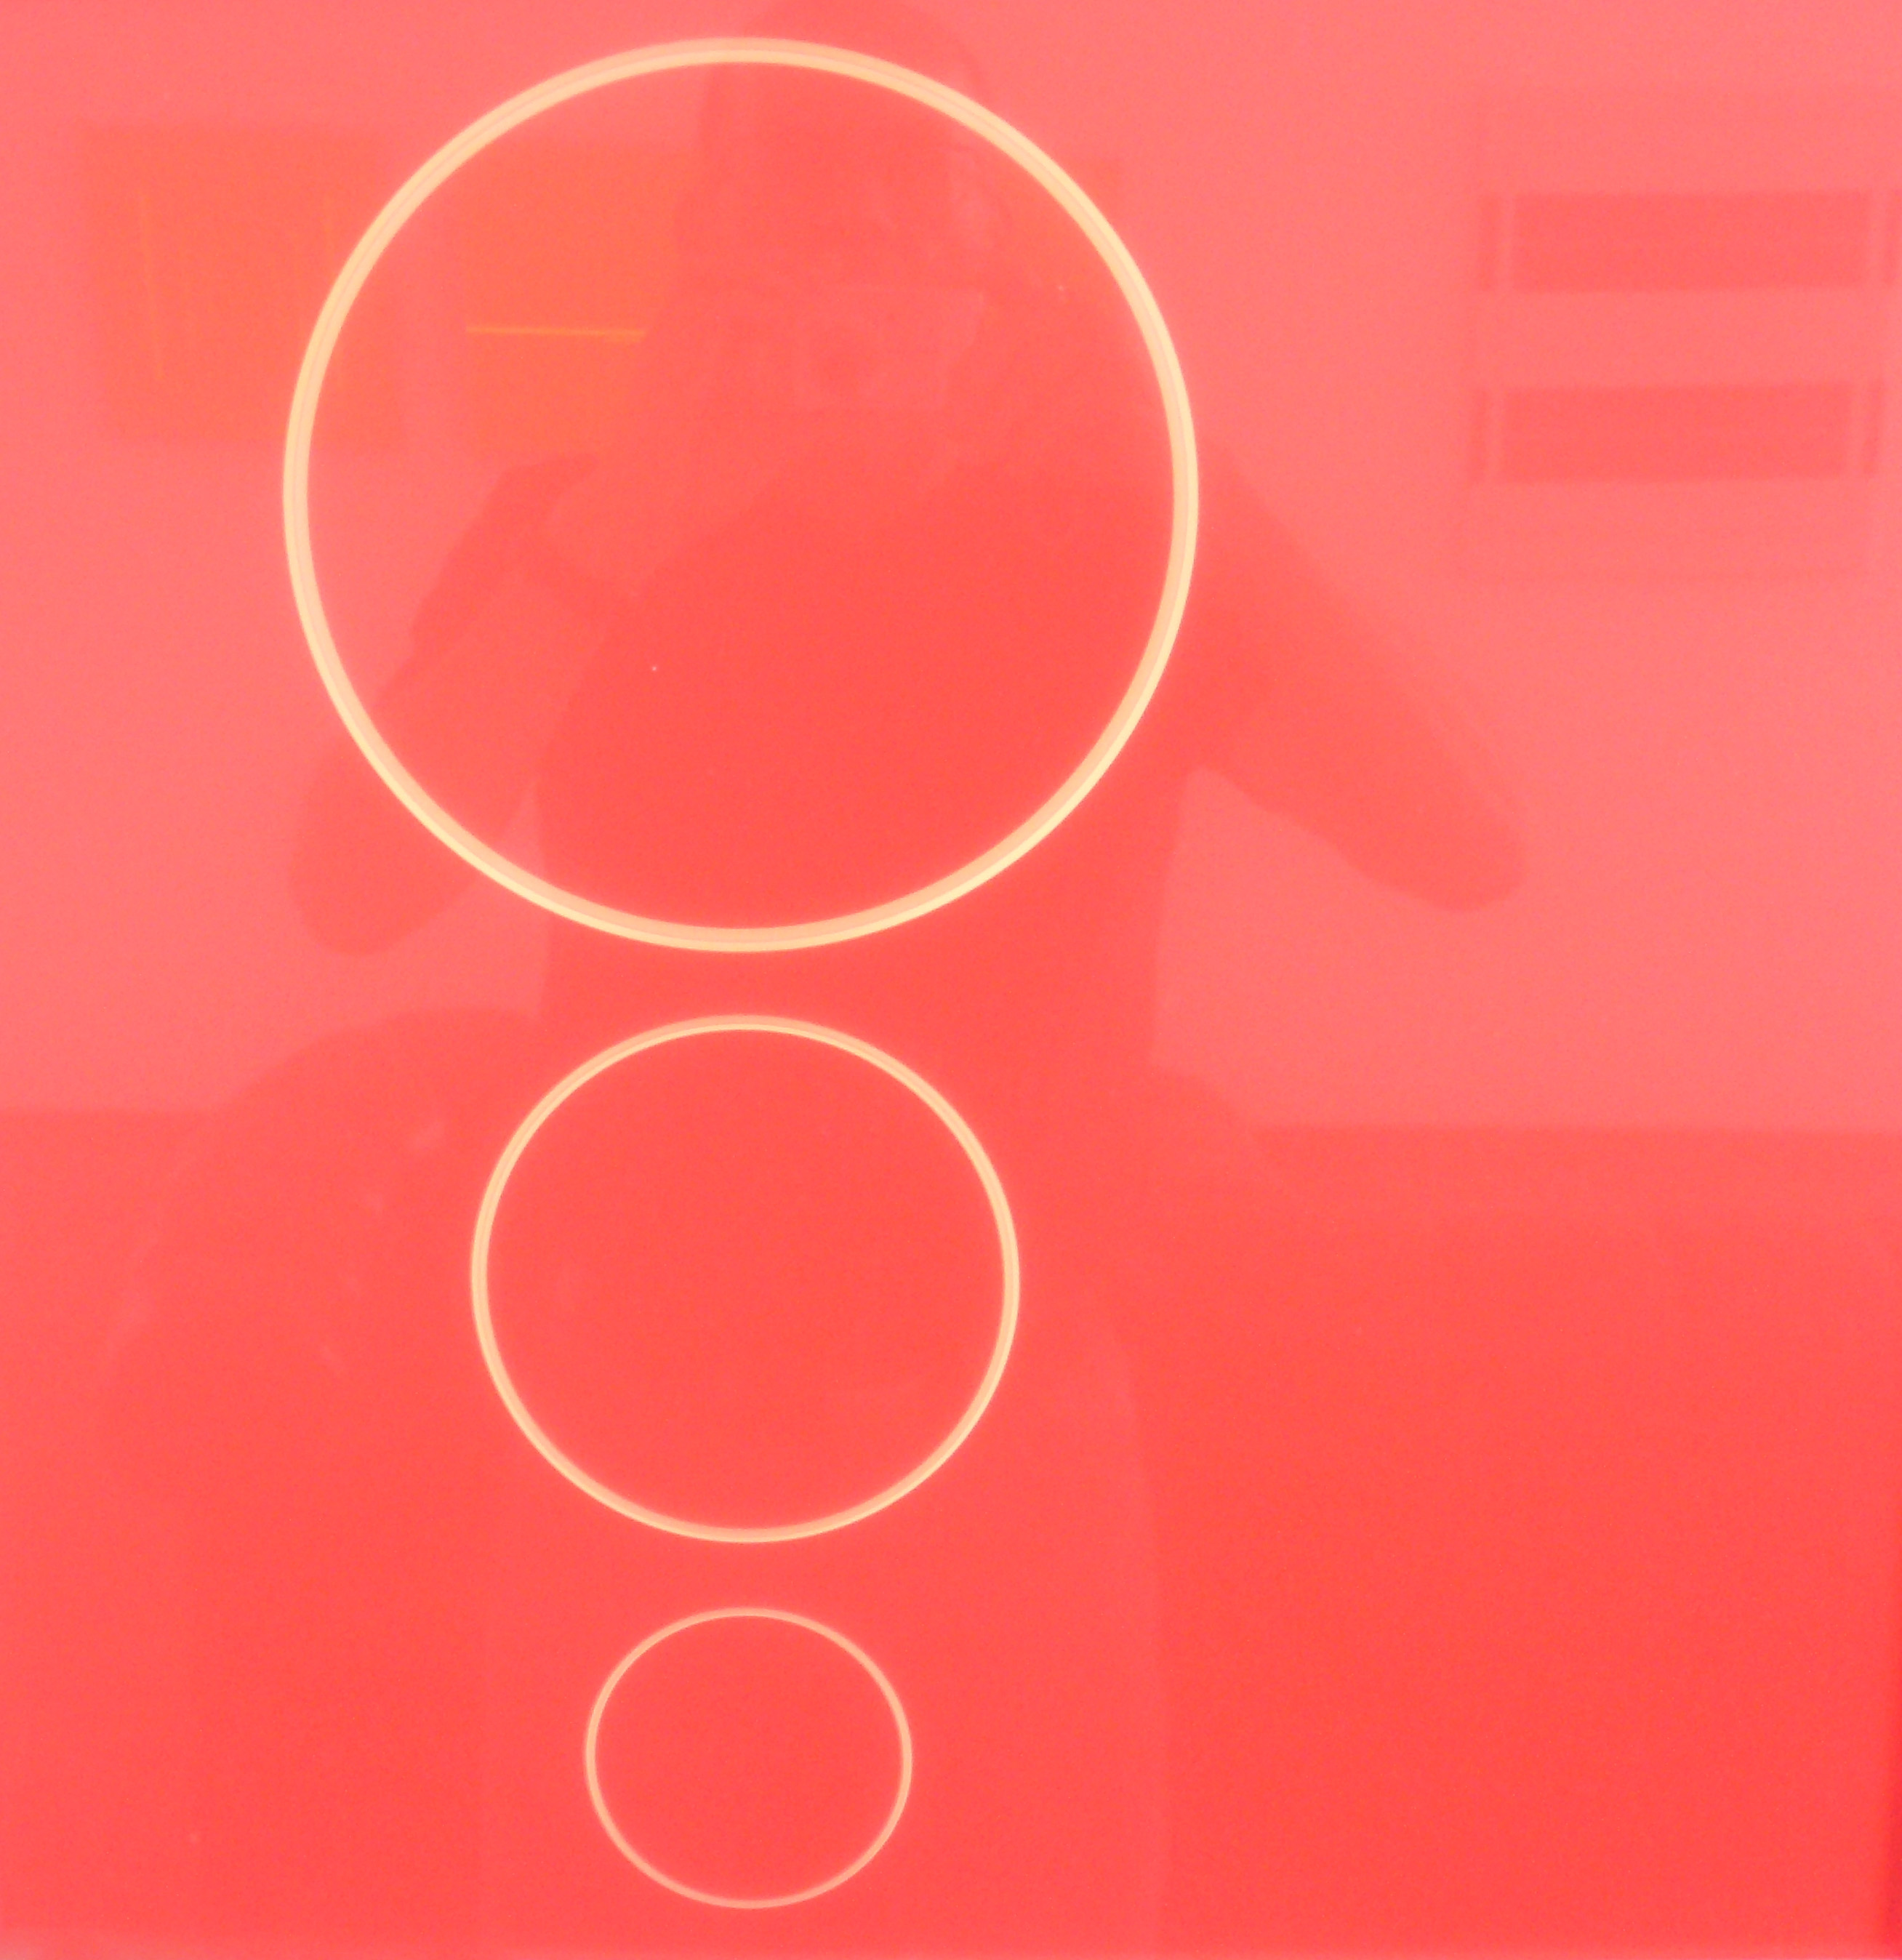 Hellmut Bruch - 3 Kreise-Doppel-Progression